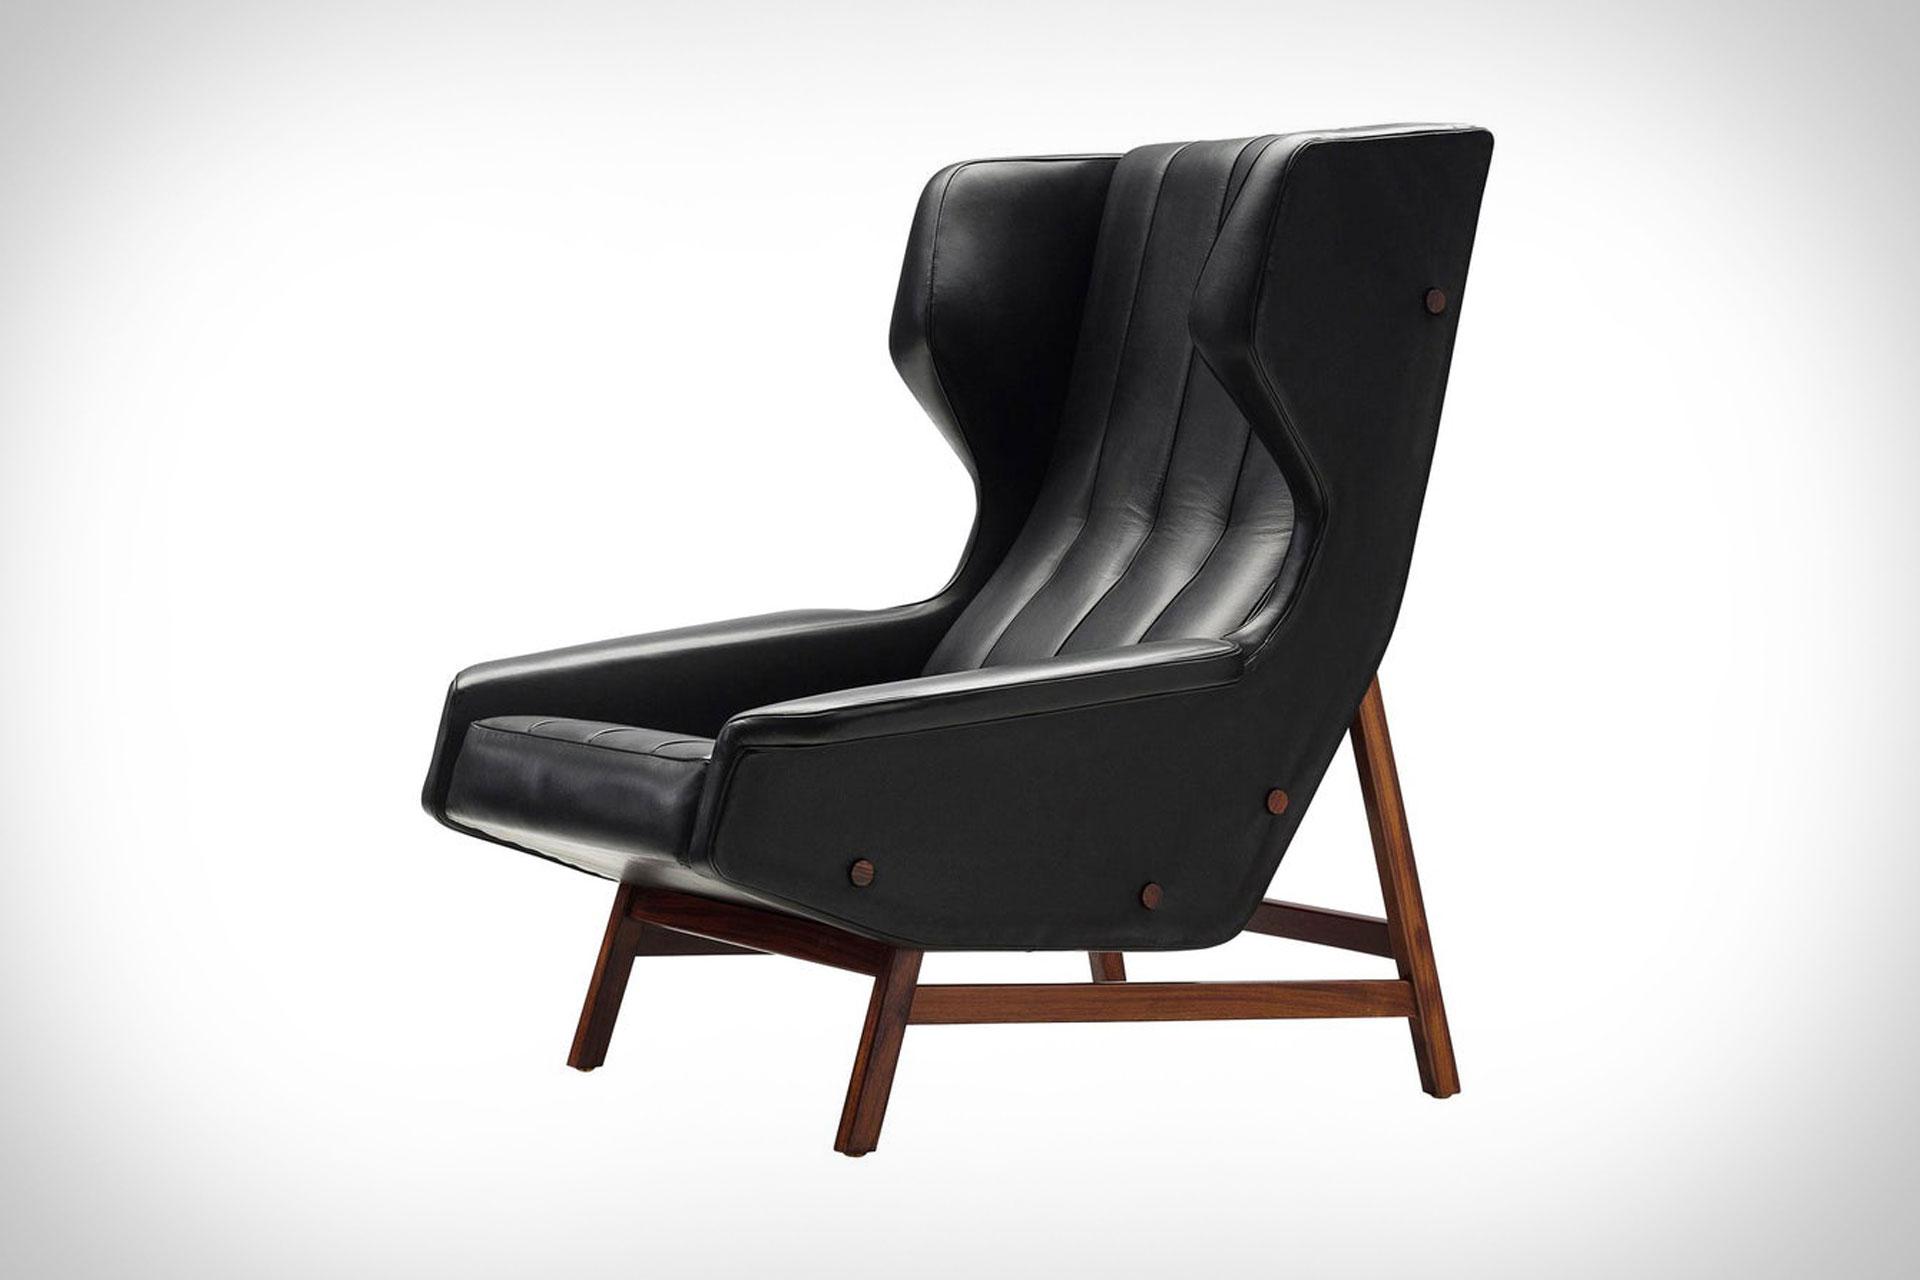 Gianfranco Frattini 877 Lounge Chair